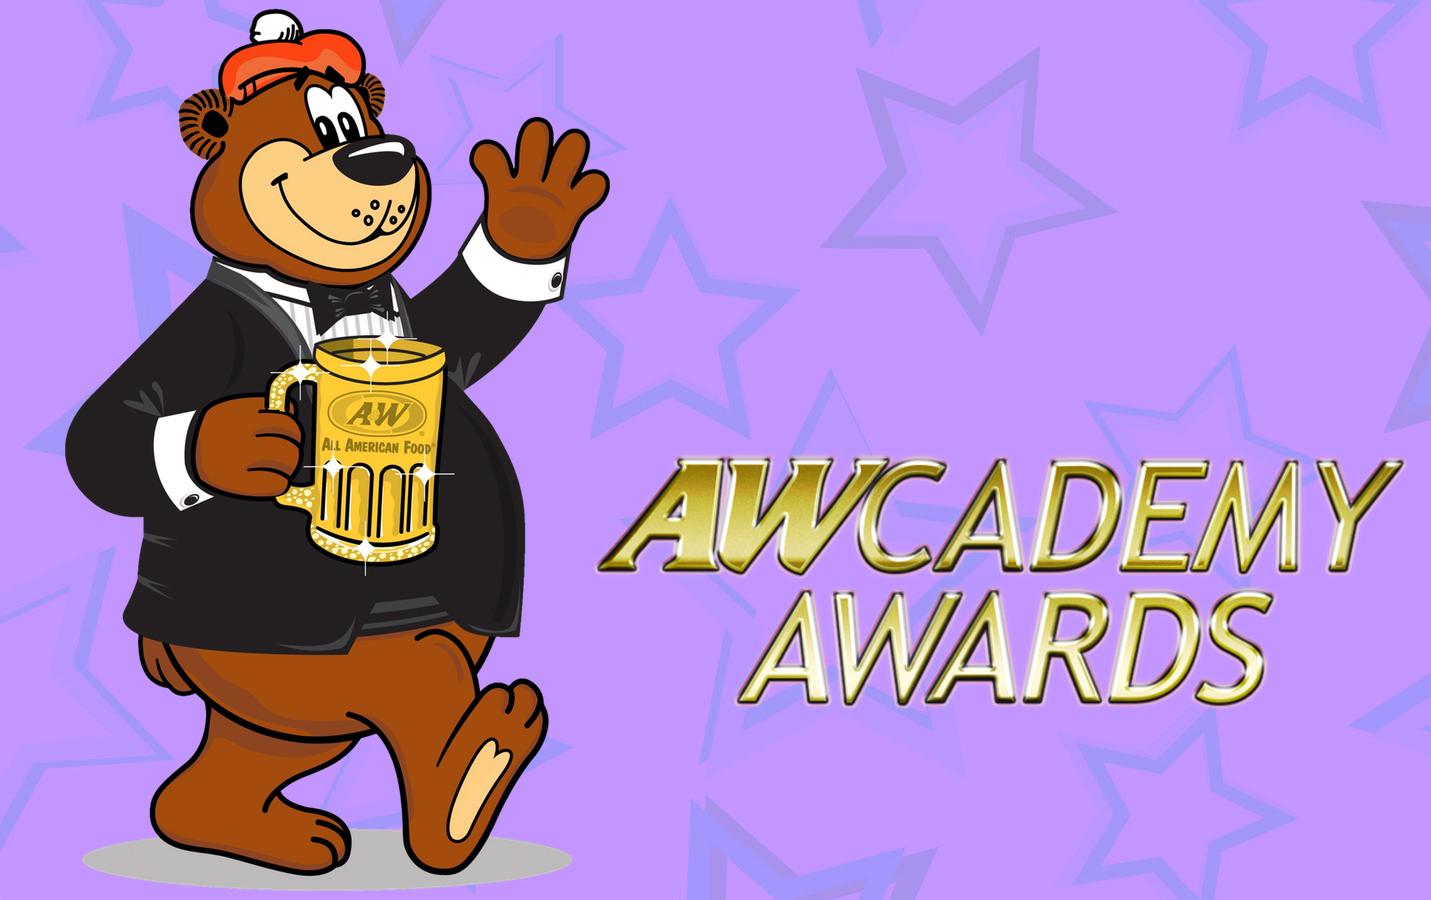 Rooty AWcademy Awards